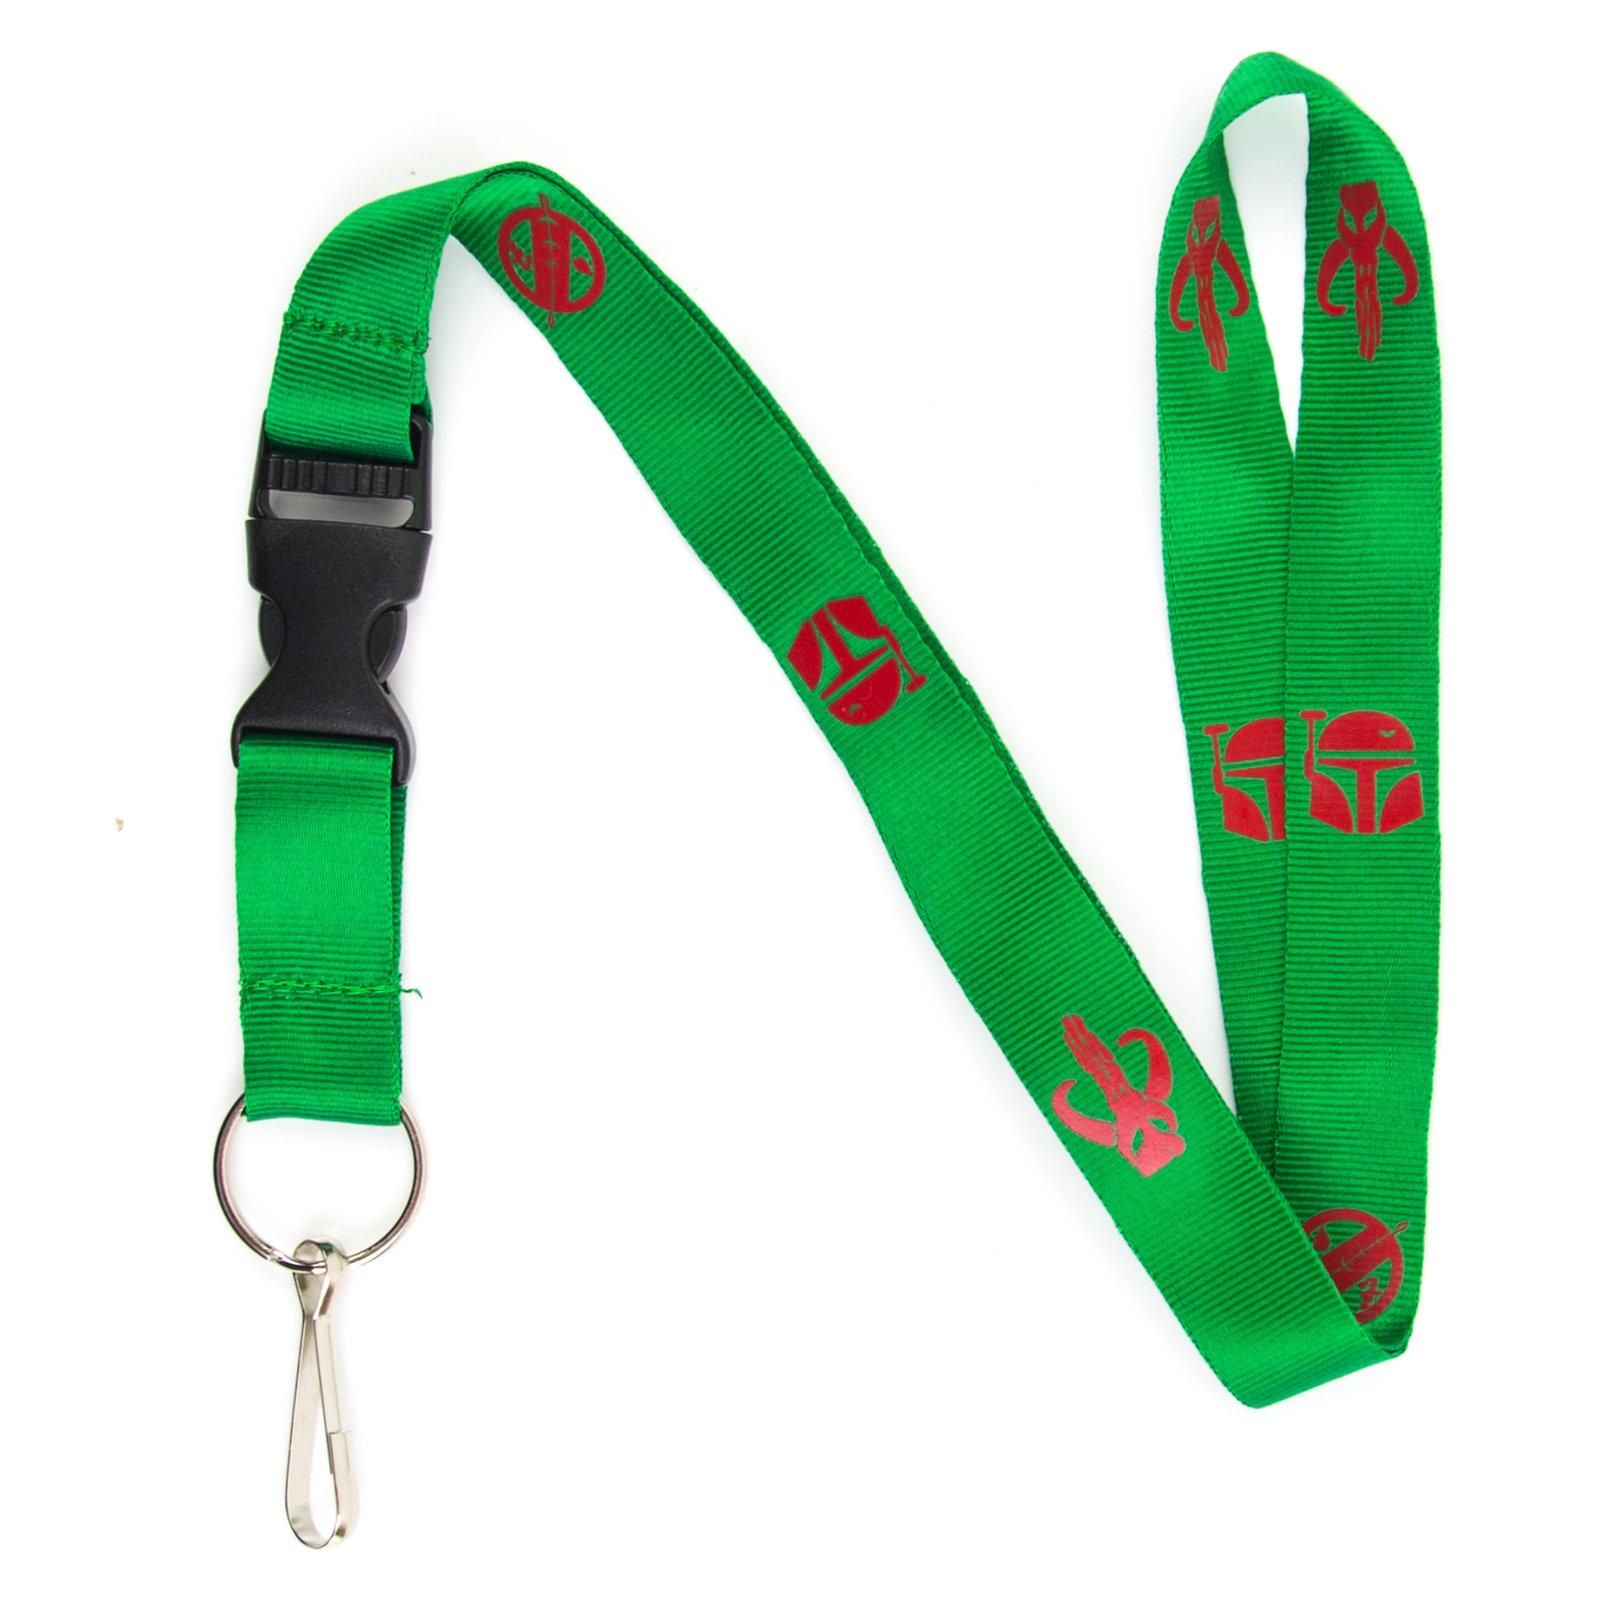 Boba Fett Mandalorian Crest Lanyard Keychain and ID Holder w/ Detachable, Breaka